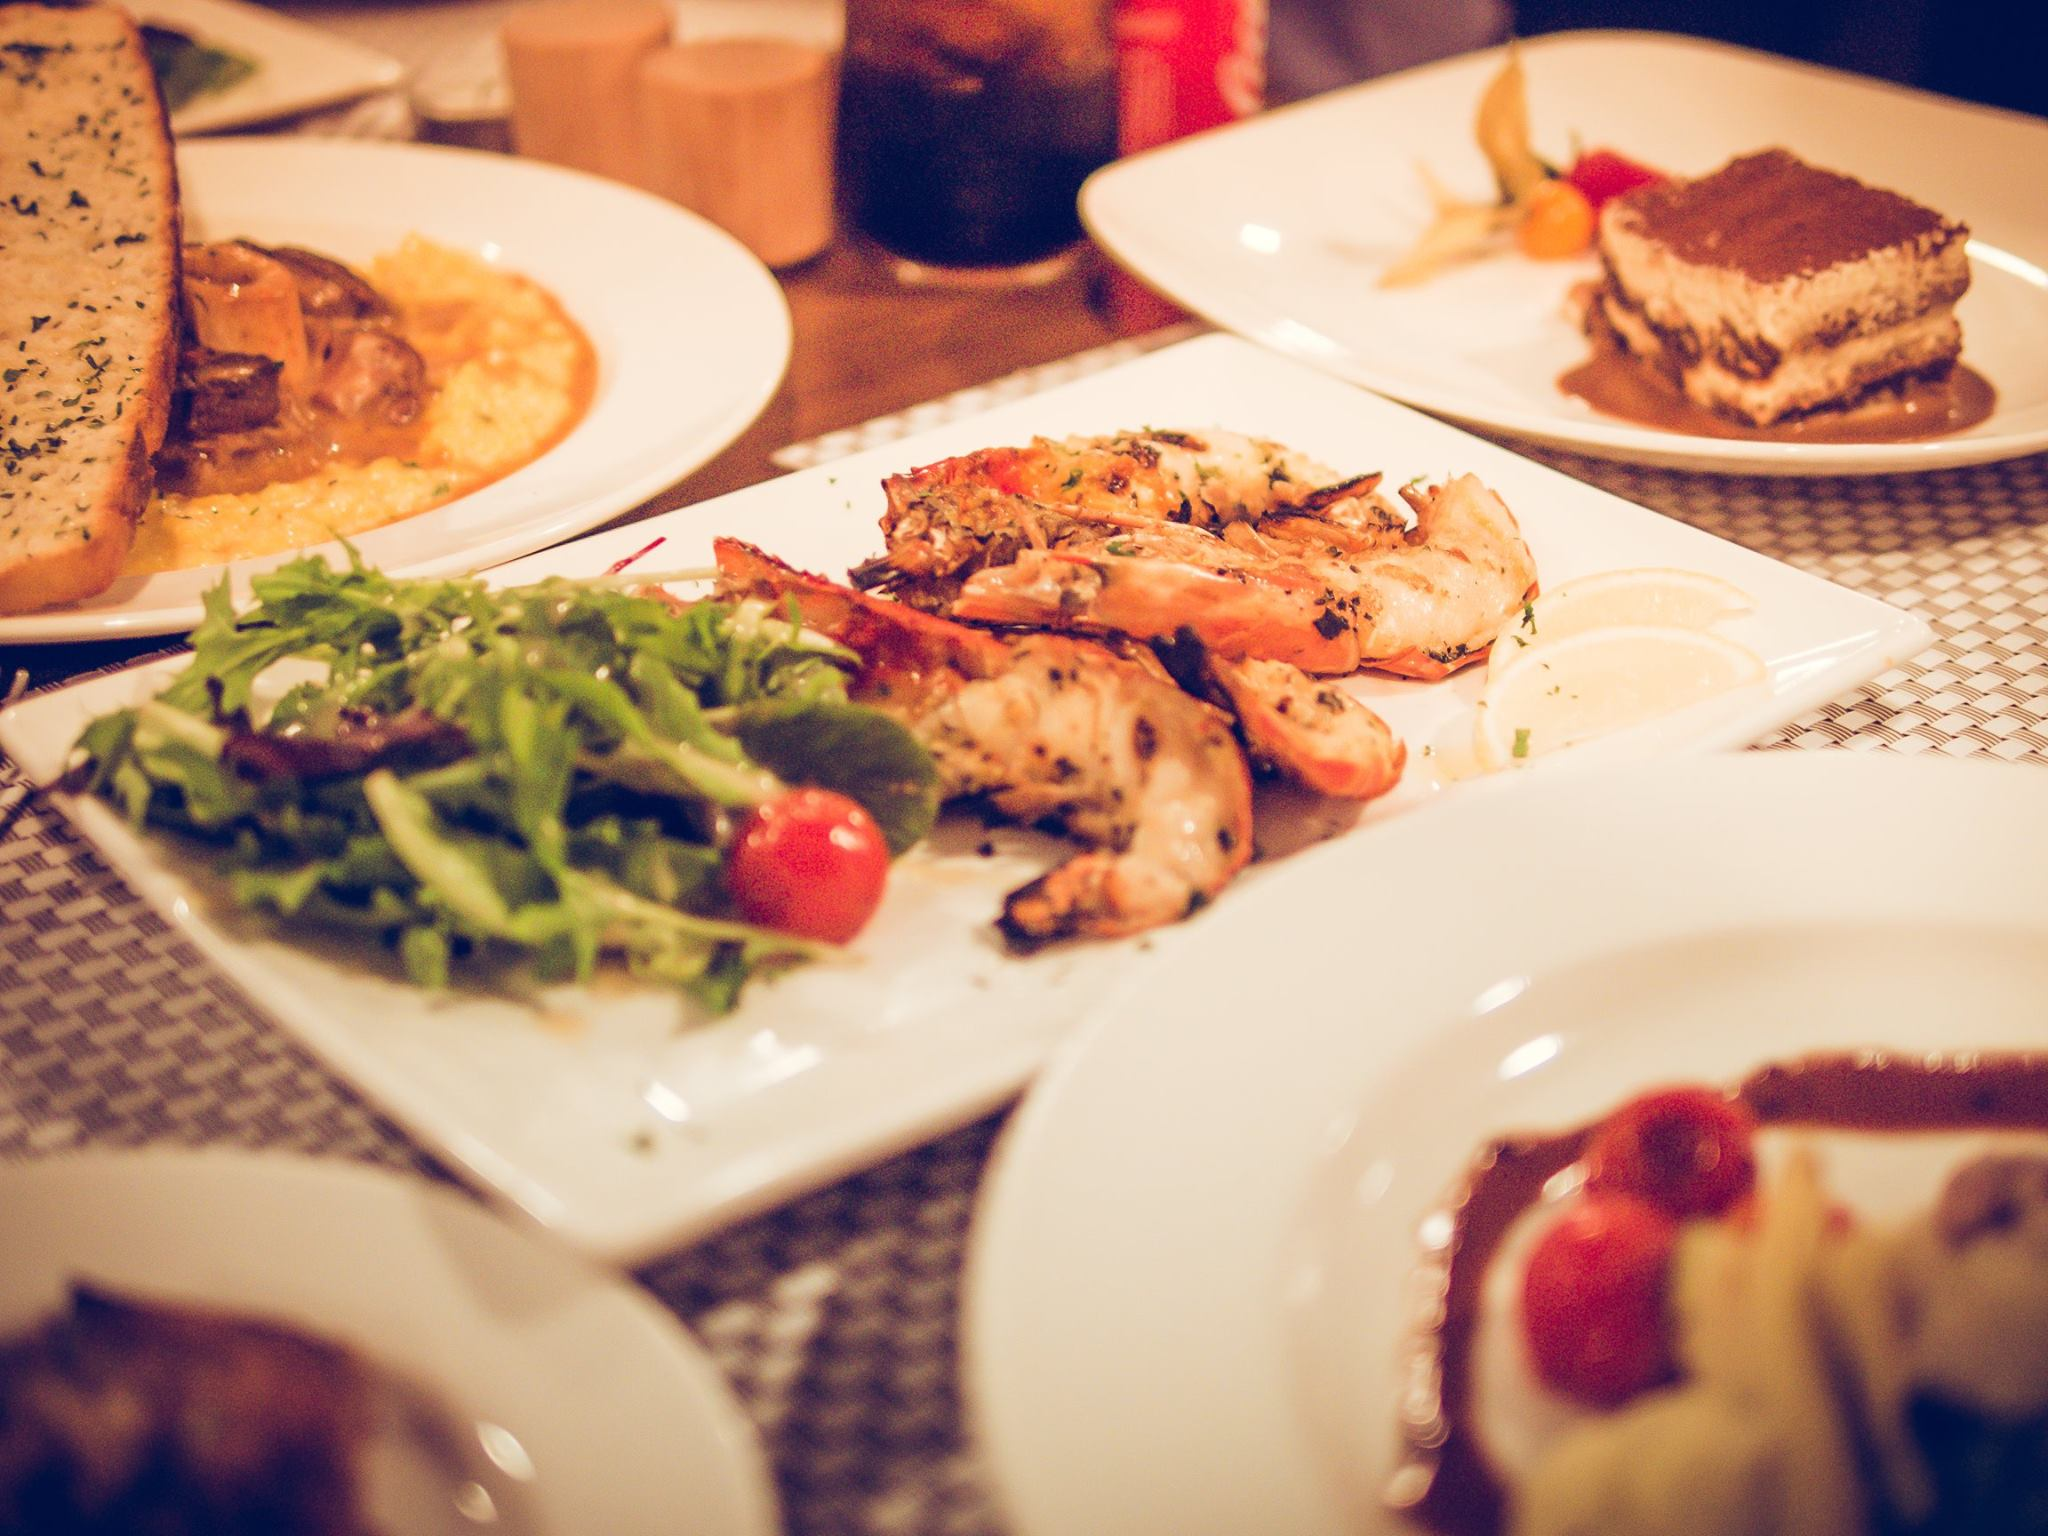 Folliathe most understated Italian restaurant in Singapore